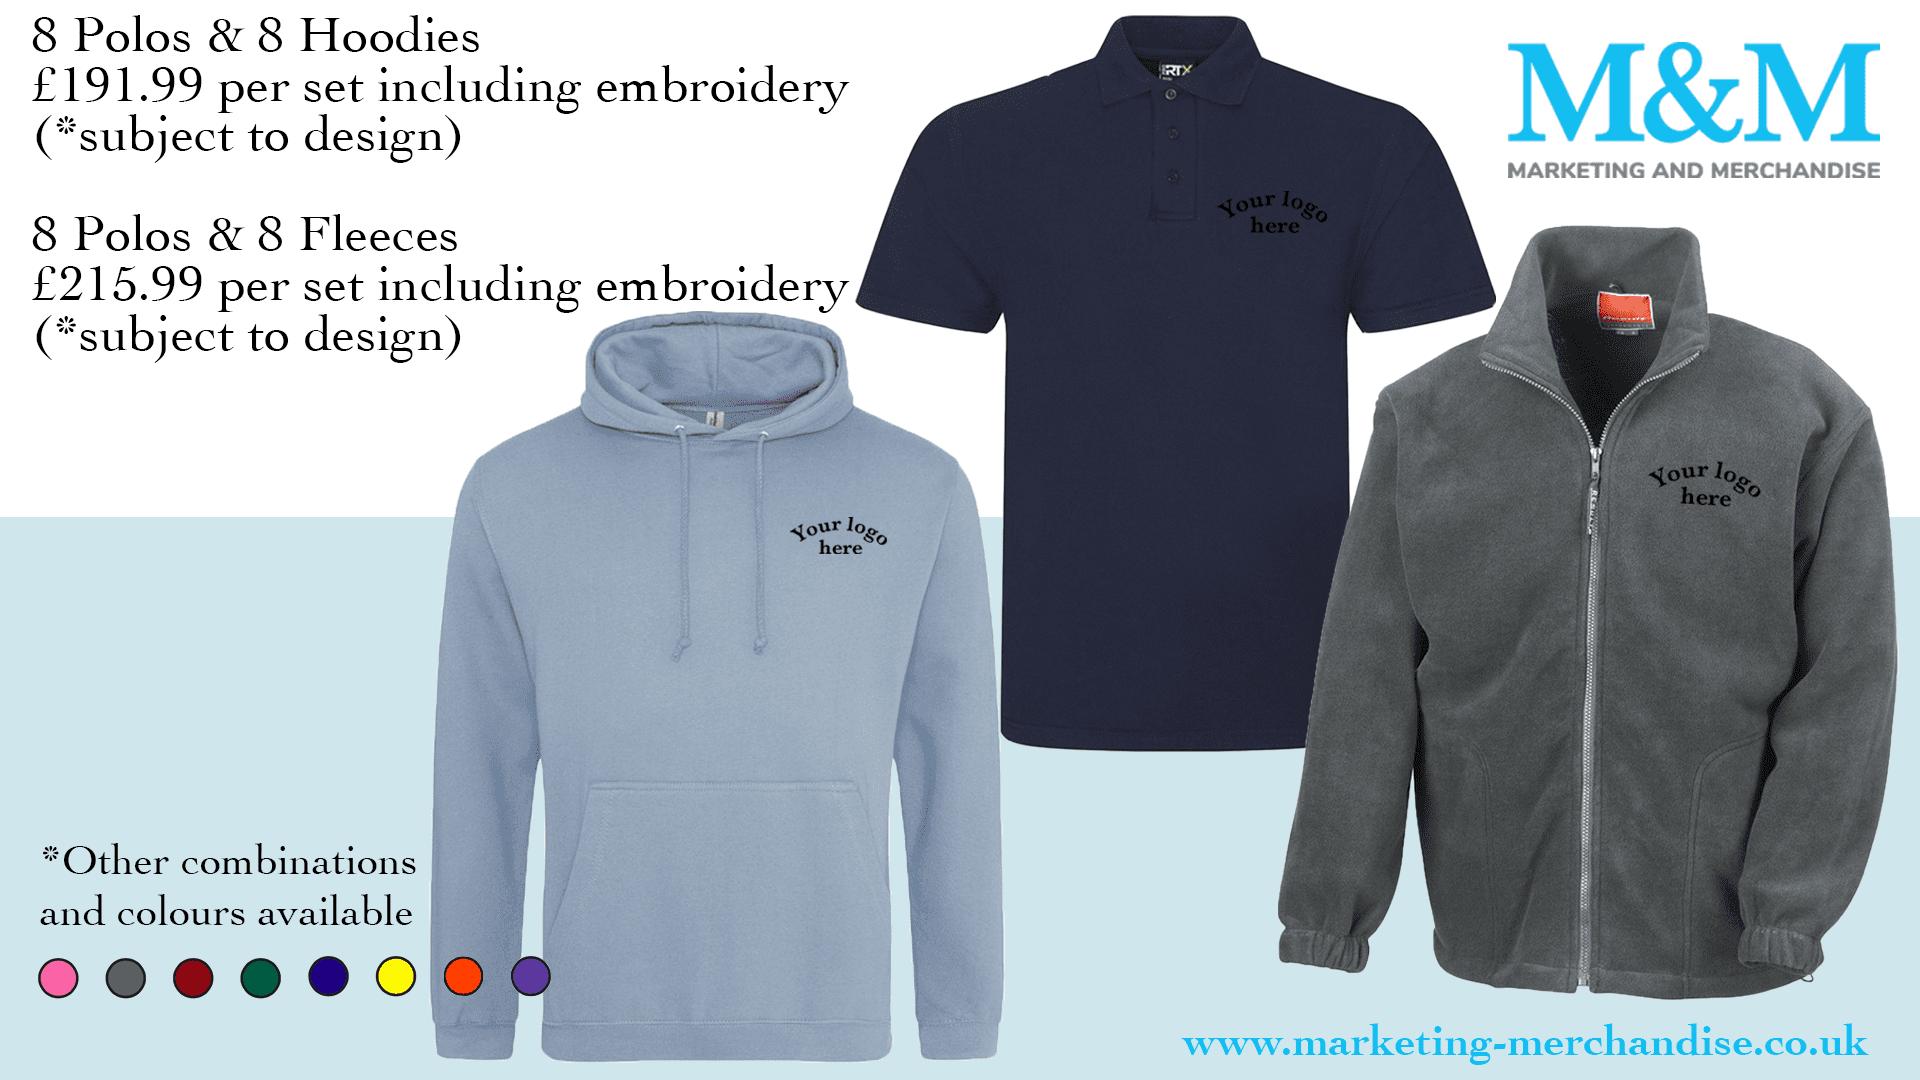 branded uniform shirts Marketing and Merchandise sweatshirts